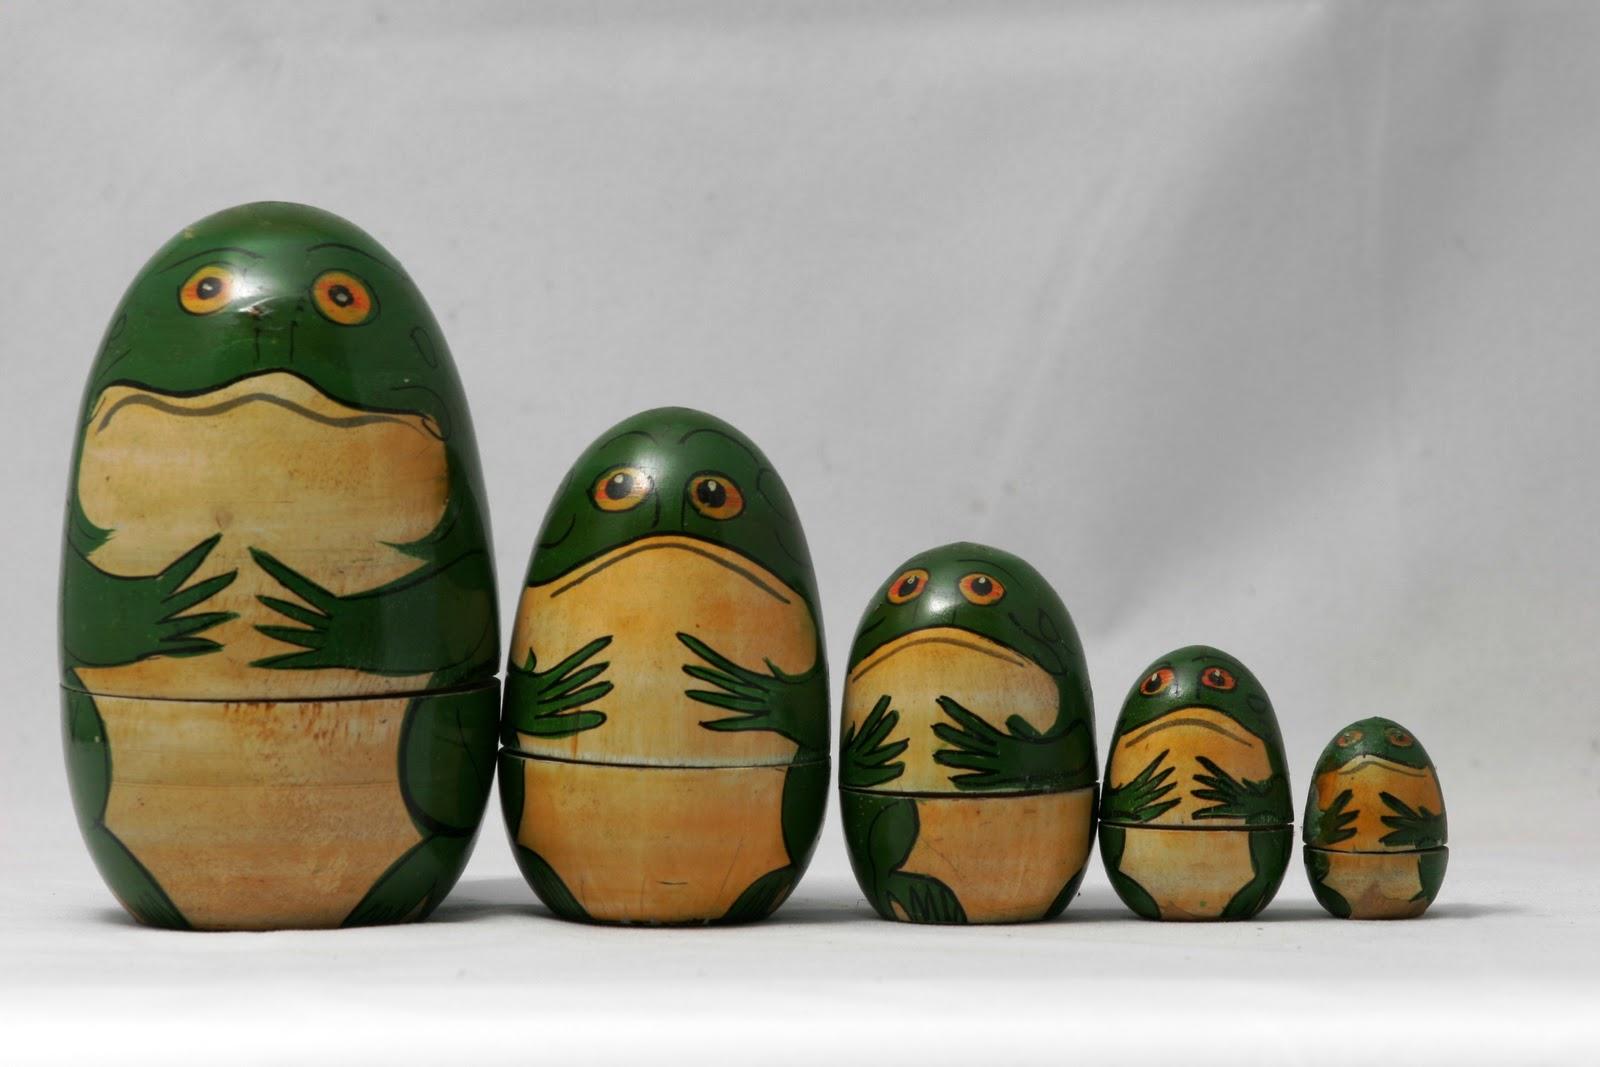 Kuwento Ni Kapitan Kokak Frogs As Fertility Symbols